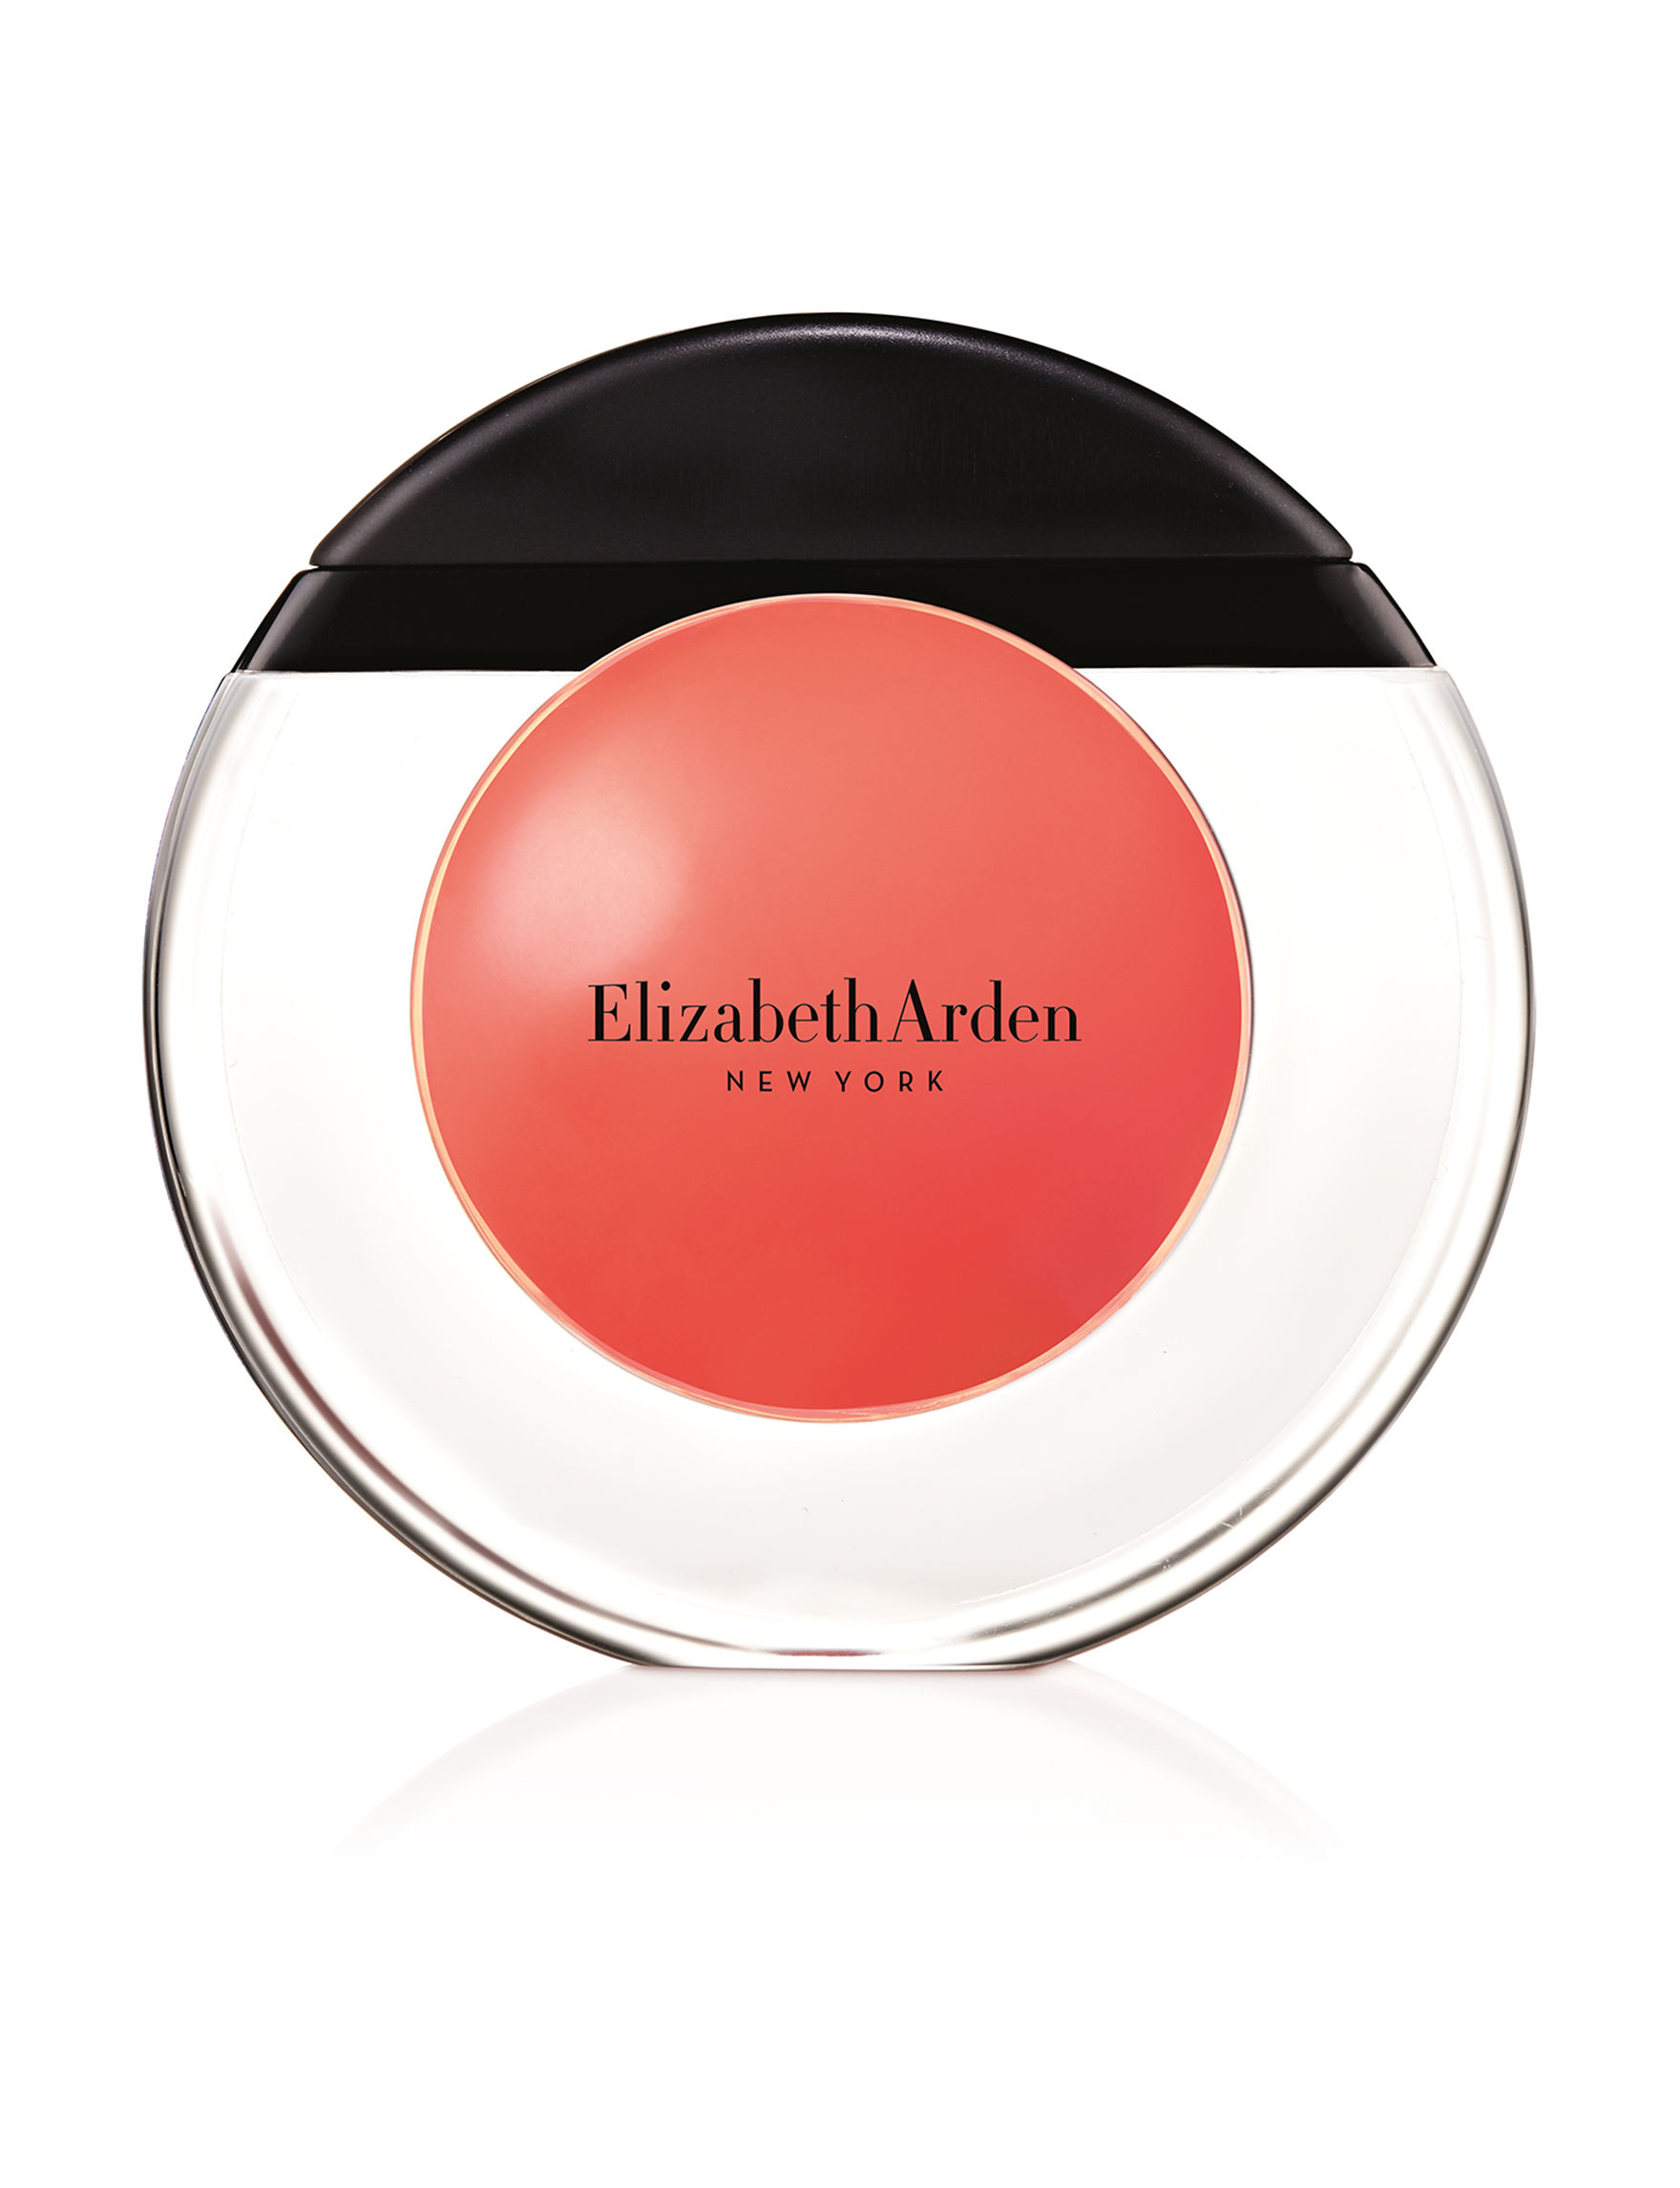 Elizabeth Arden Coral Caress Lips Lip Gloss